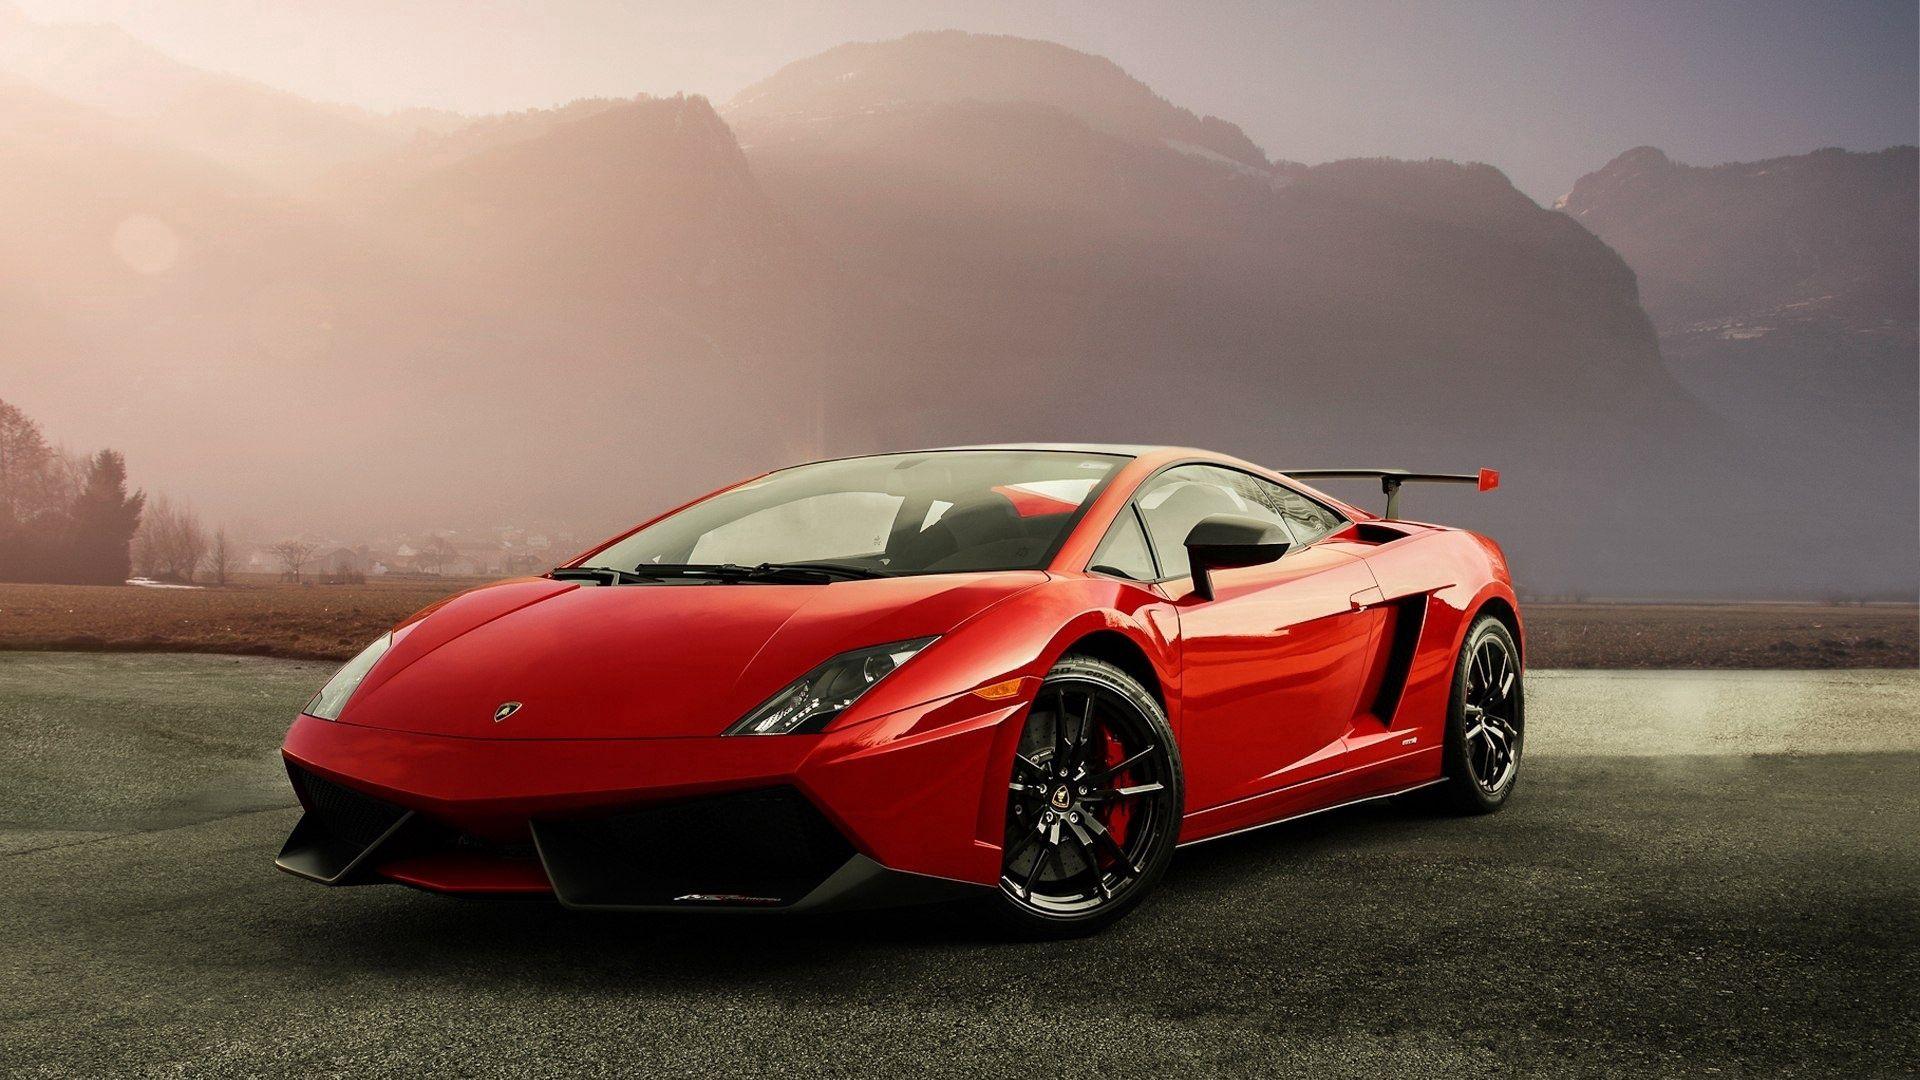 The Wallpapers Related to Lamborghini, Gallardo, Cars, Car